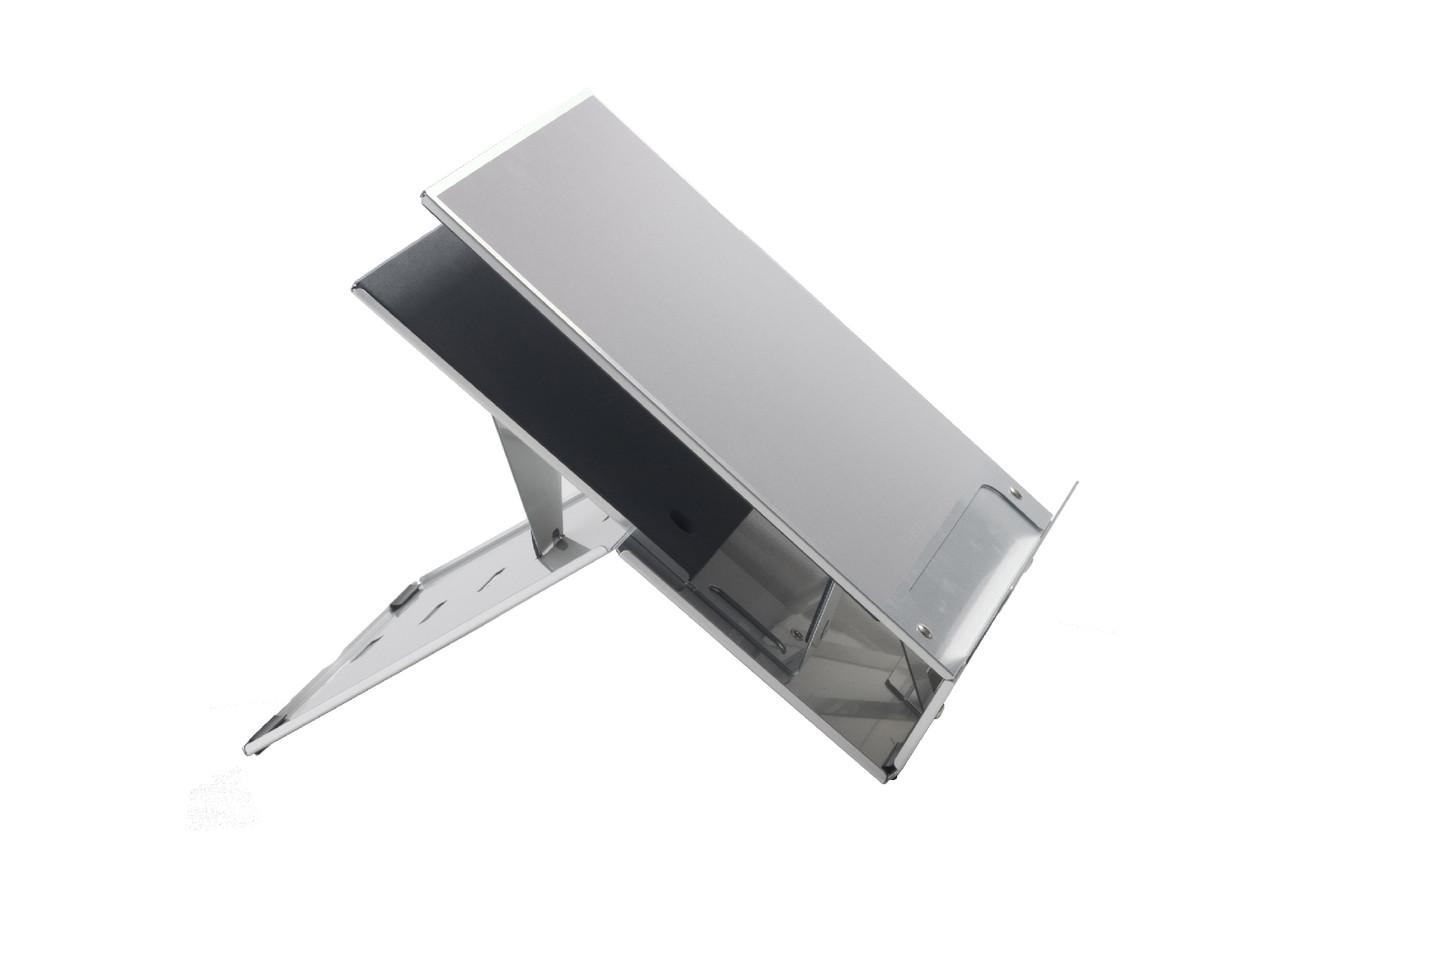 ergo-q-220-notebook-stand-1395147951.jpg